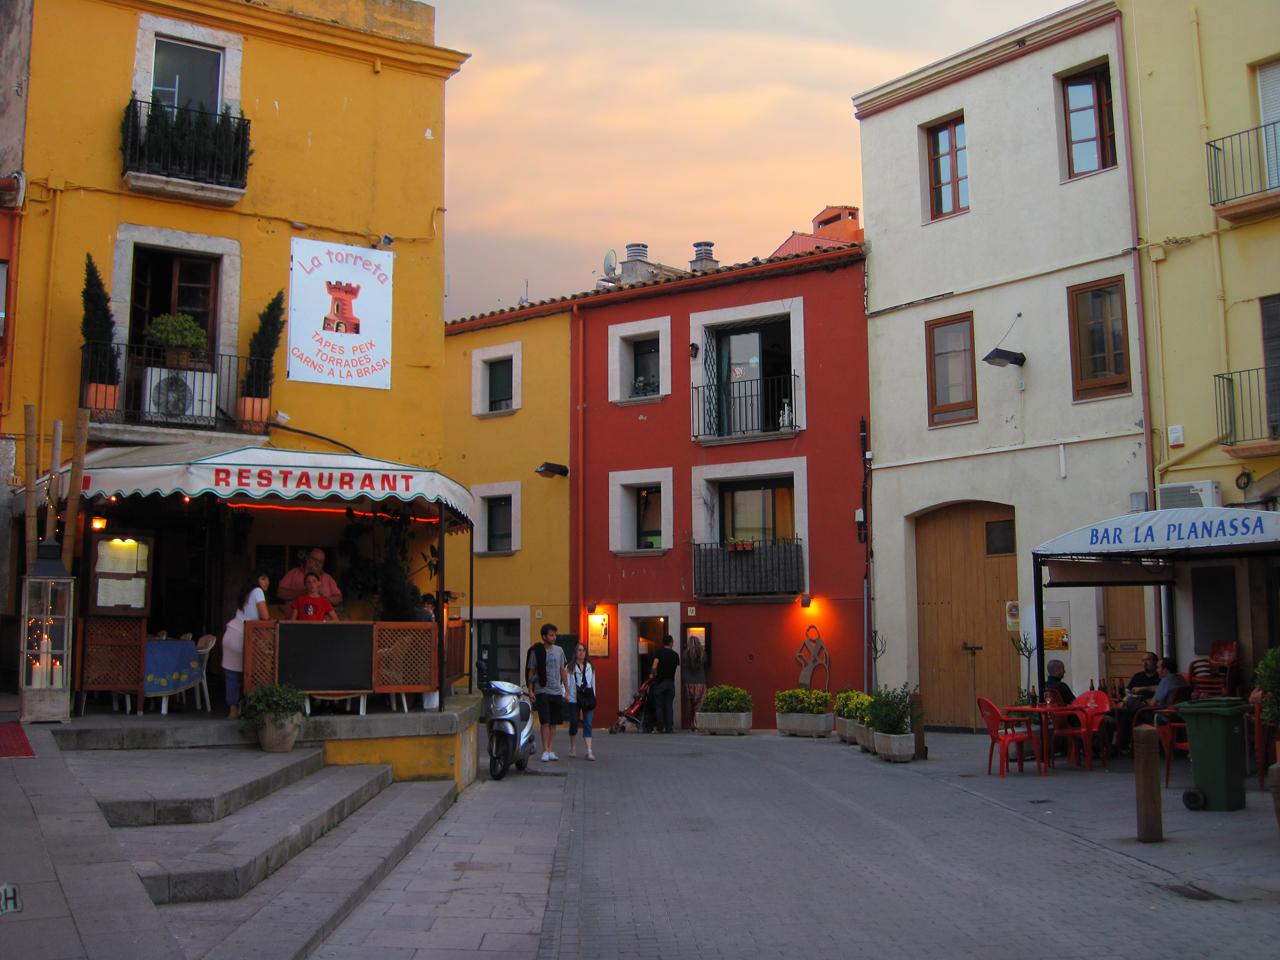 Fotografia edurne iza octubre 2011 - Restaurante de edurne pasaban ...